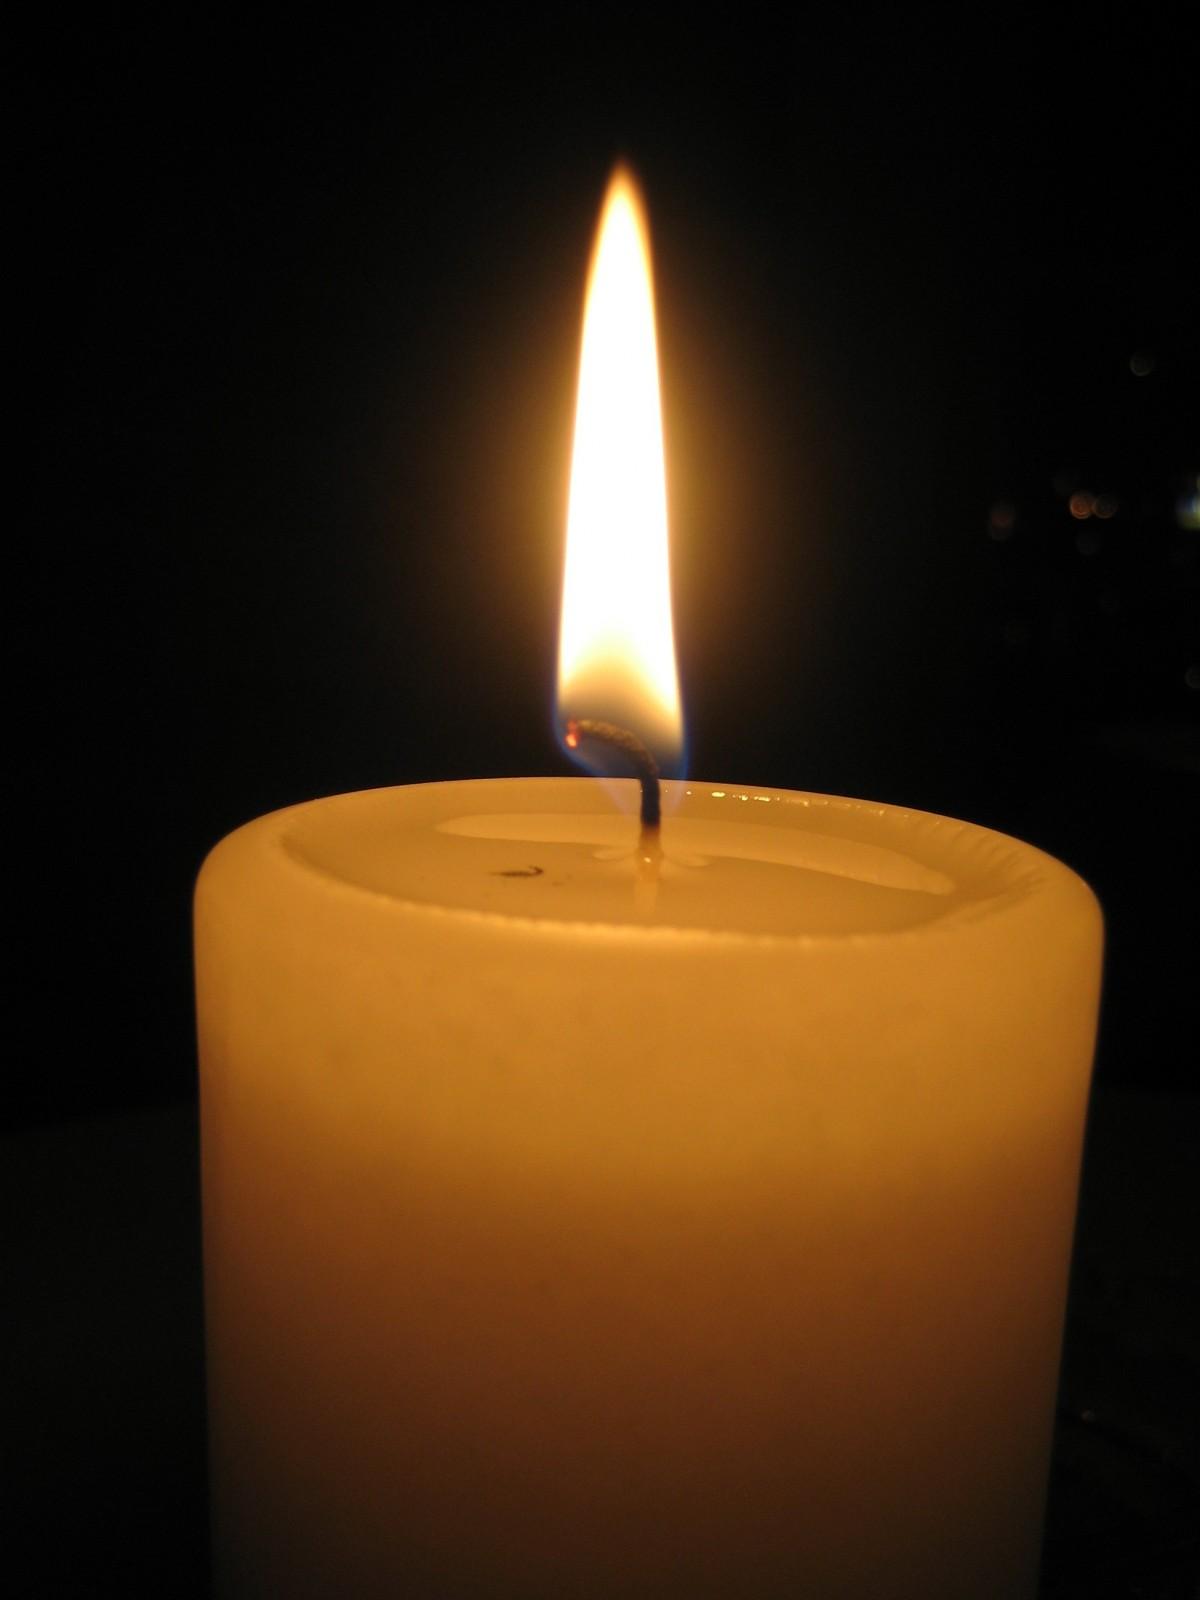 Горит свеча картинки, своими руками